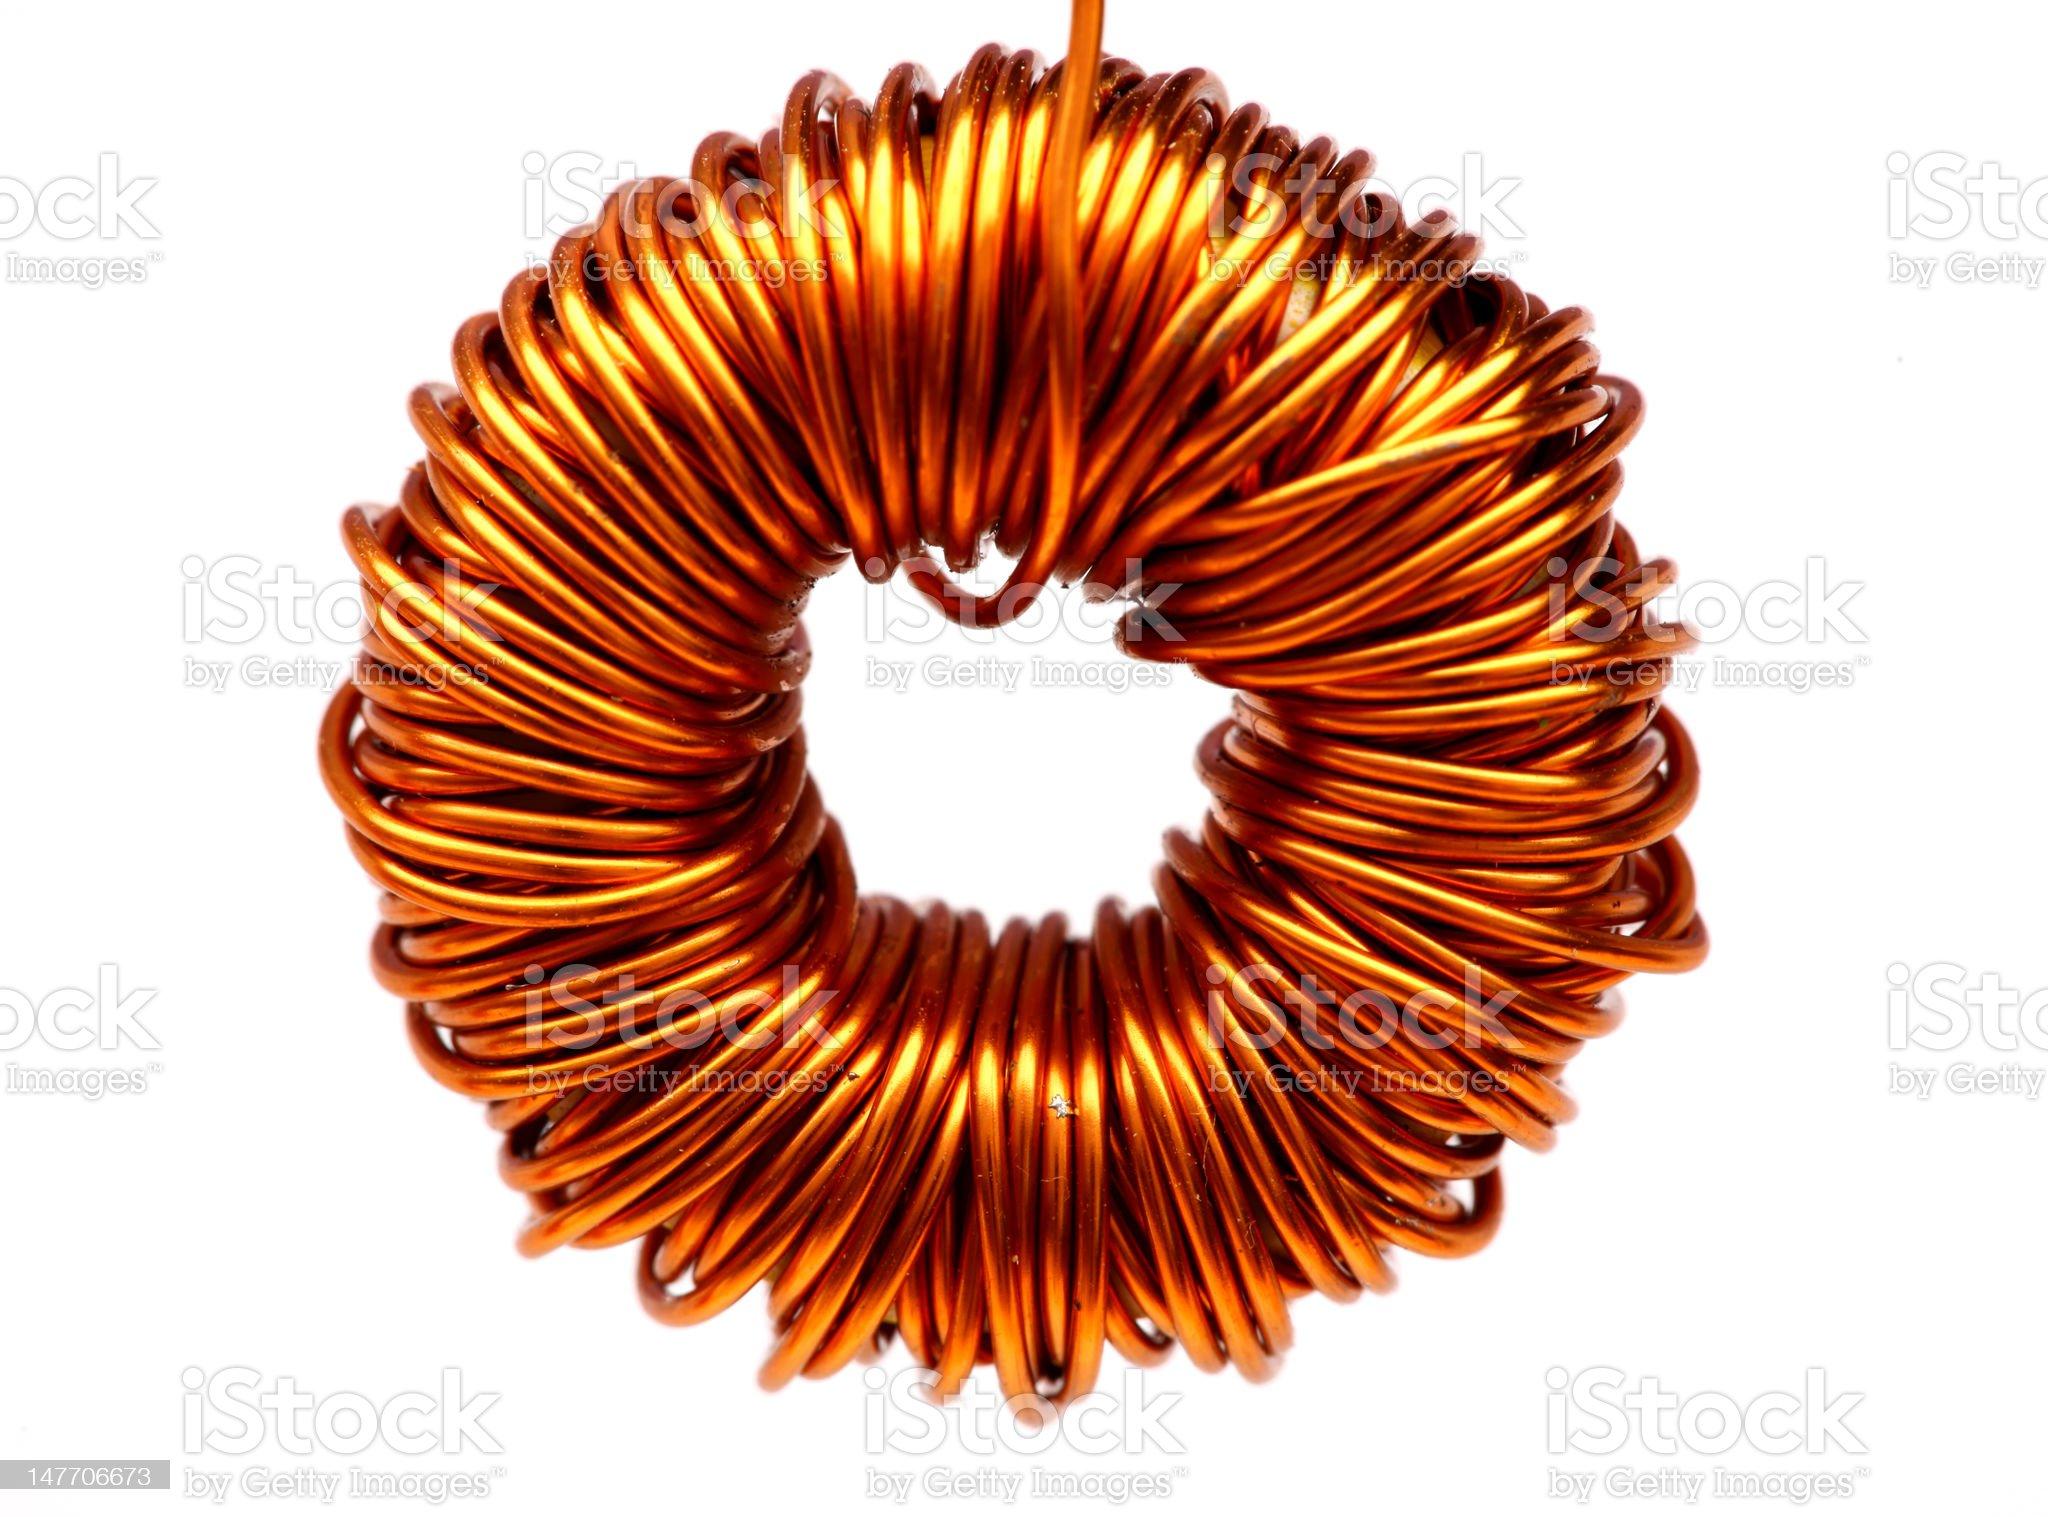 copper spool royalty-free stock photo